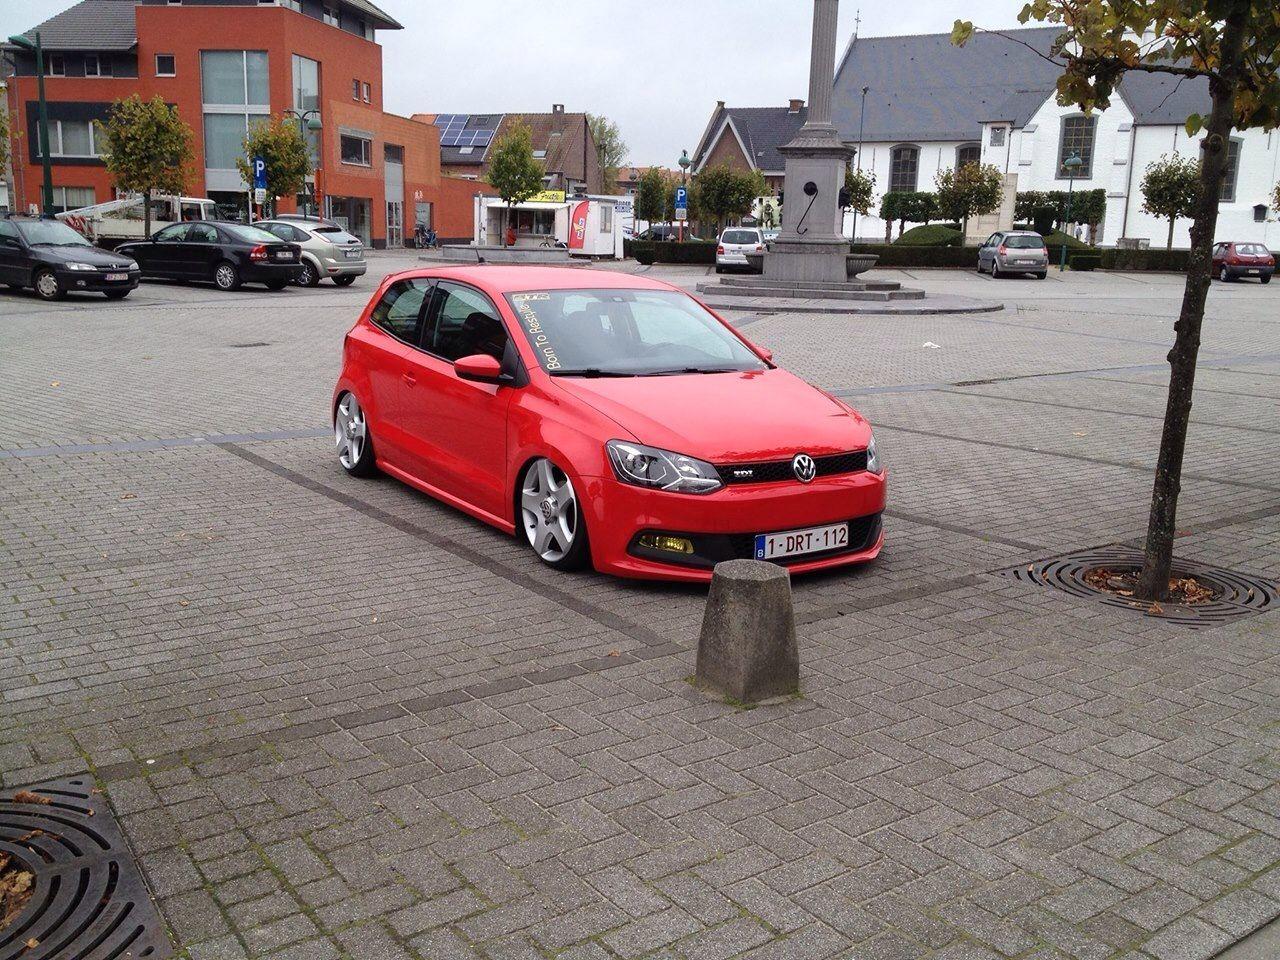 Pin De Ouroborossnyder En A Volkswagen Carros Y Motos Autos Coches